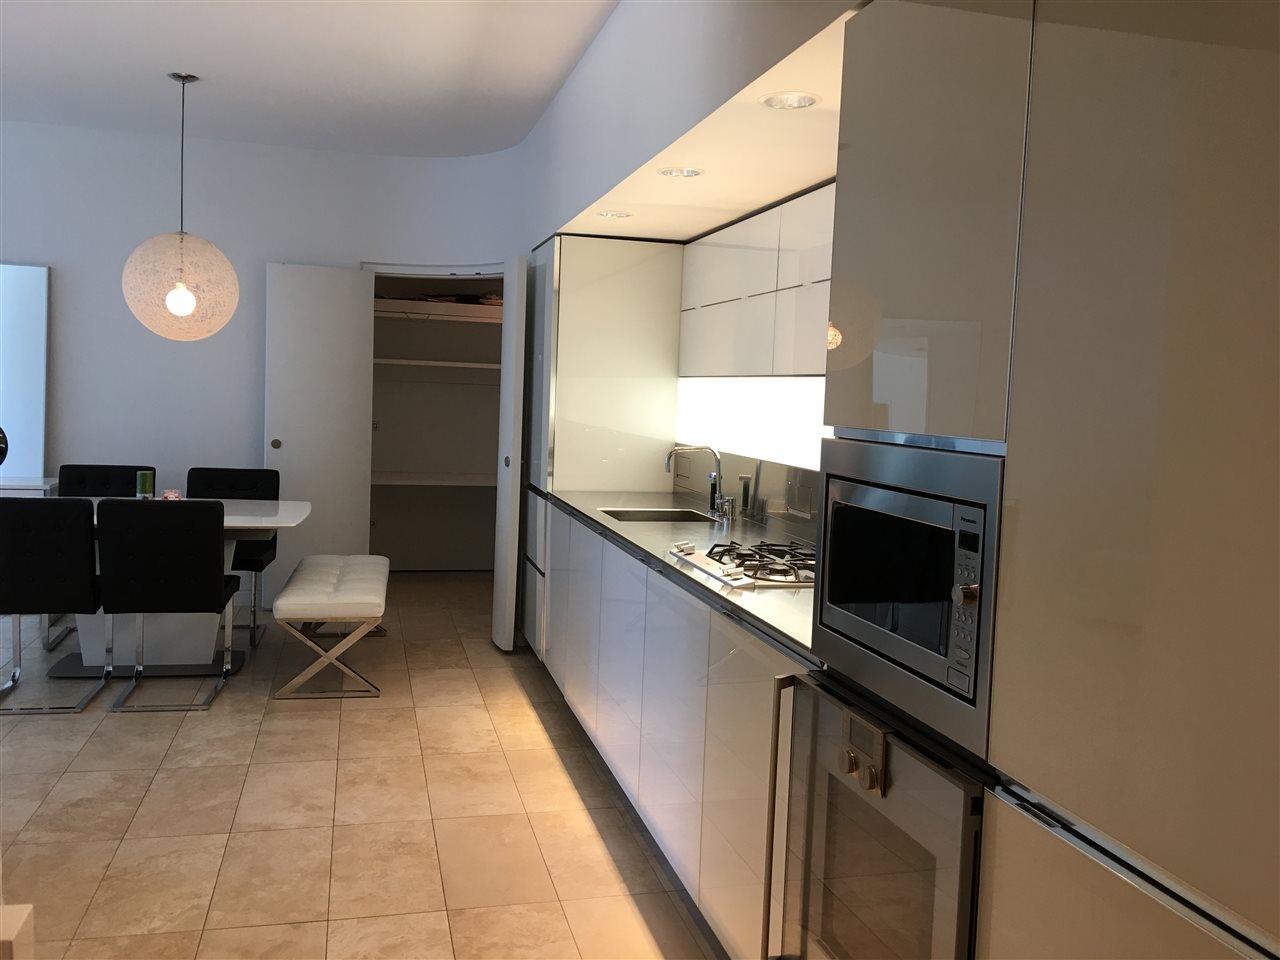 Condo Apartment at 1407 838 W HASTINGS STREET, Unit 1407, Vancouver West, British Columbia. Image 8